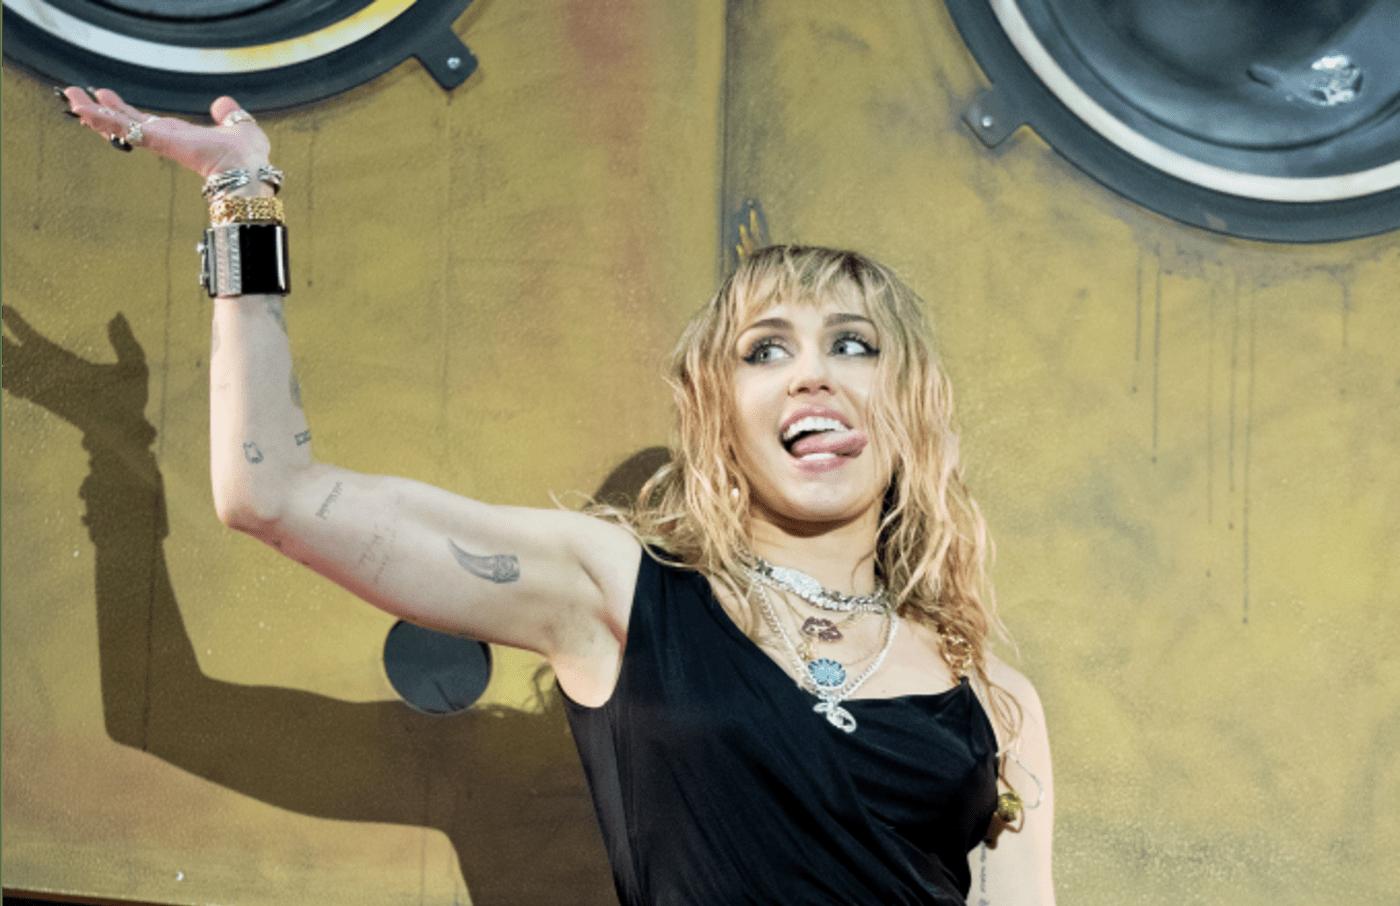 Miley Cyrus performs at the Radio 1 Big Weekend